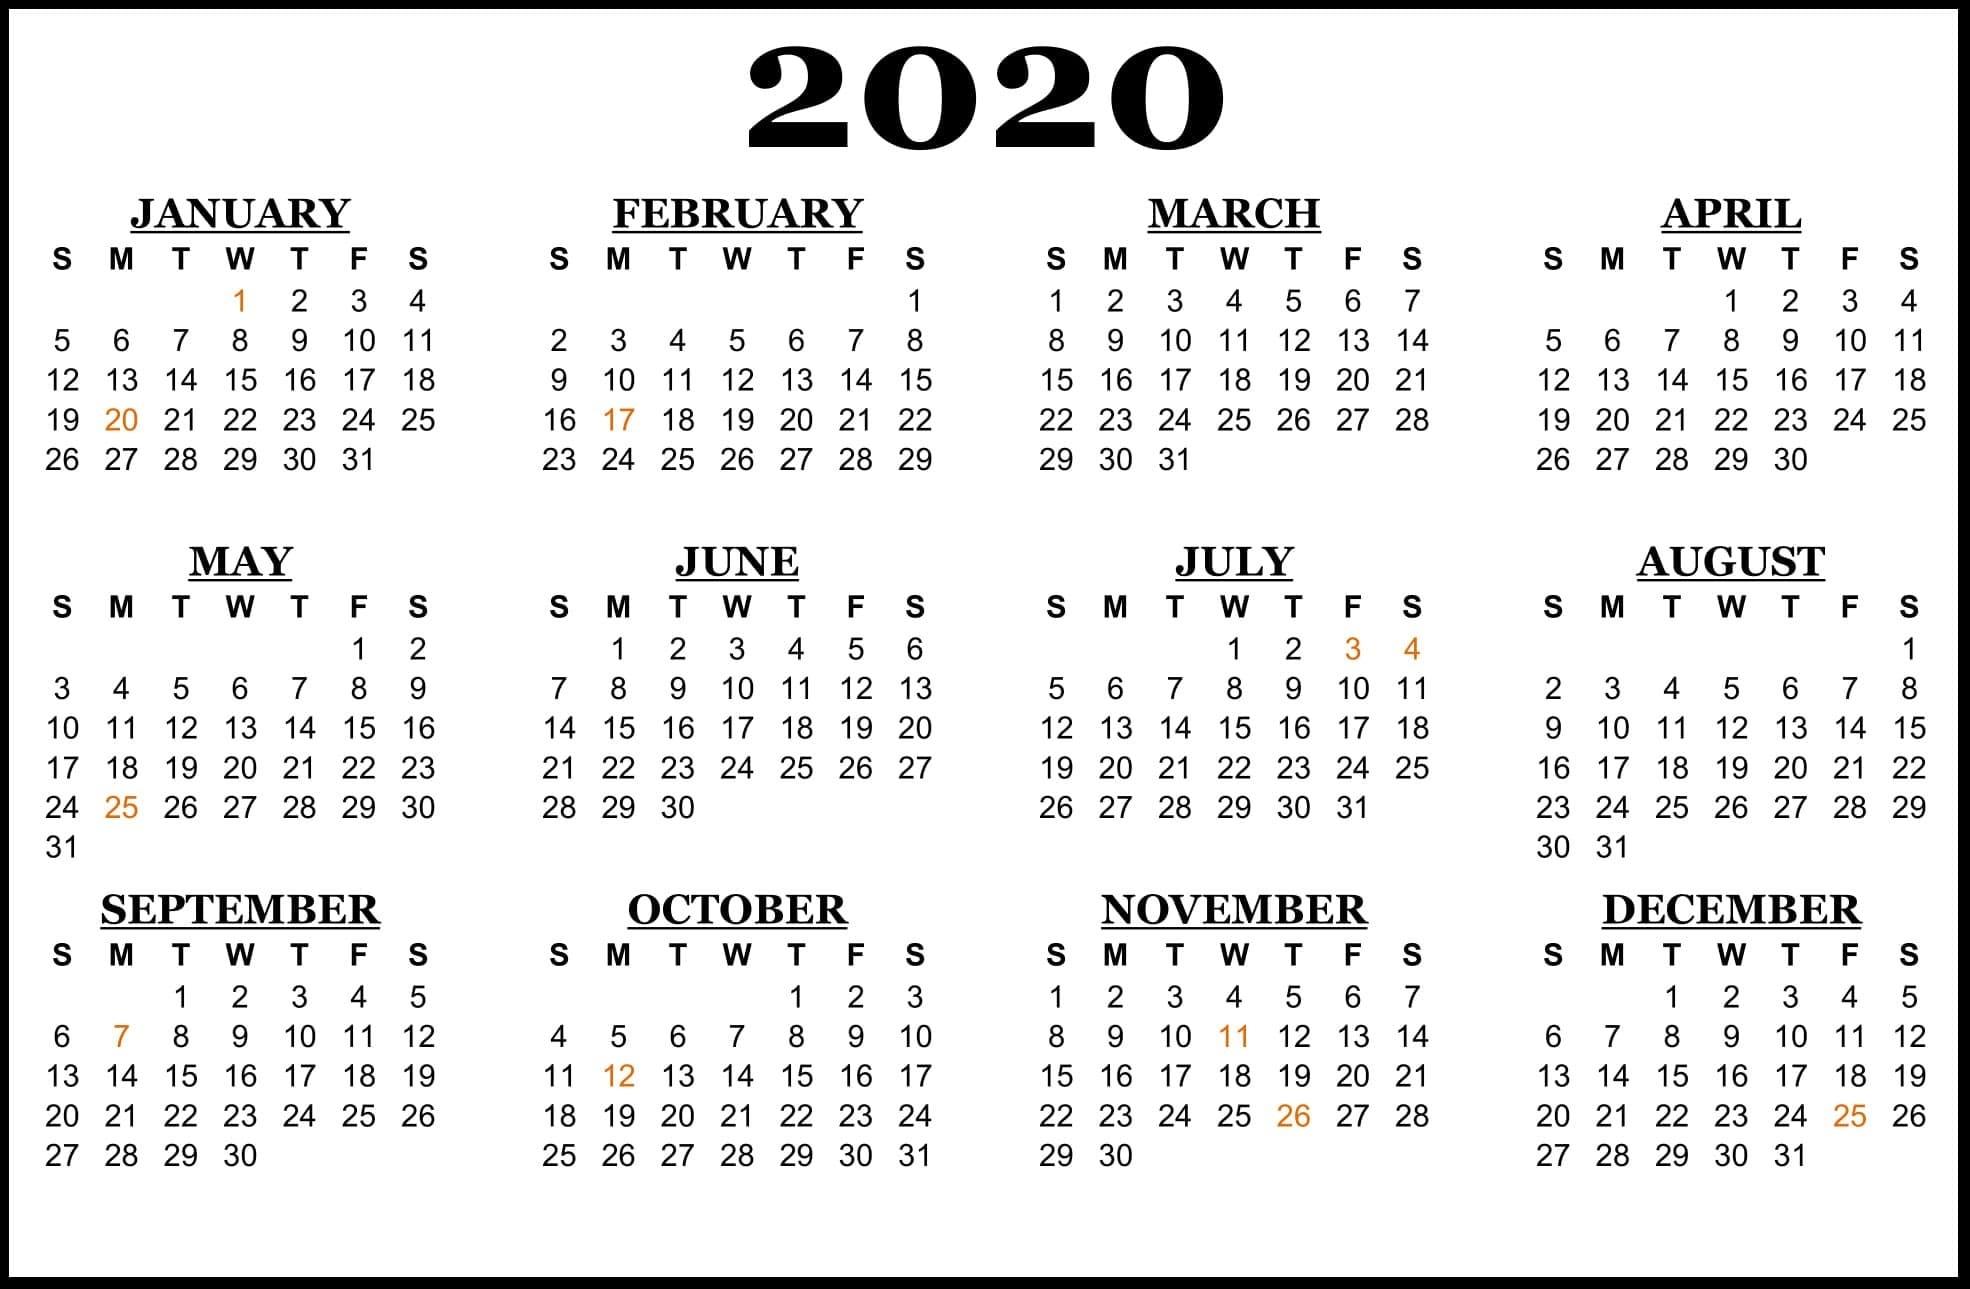 2020-Calendar-Us-Holidays | Printable Template Calendar Year 2020 Calender - South Africa